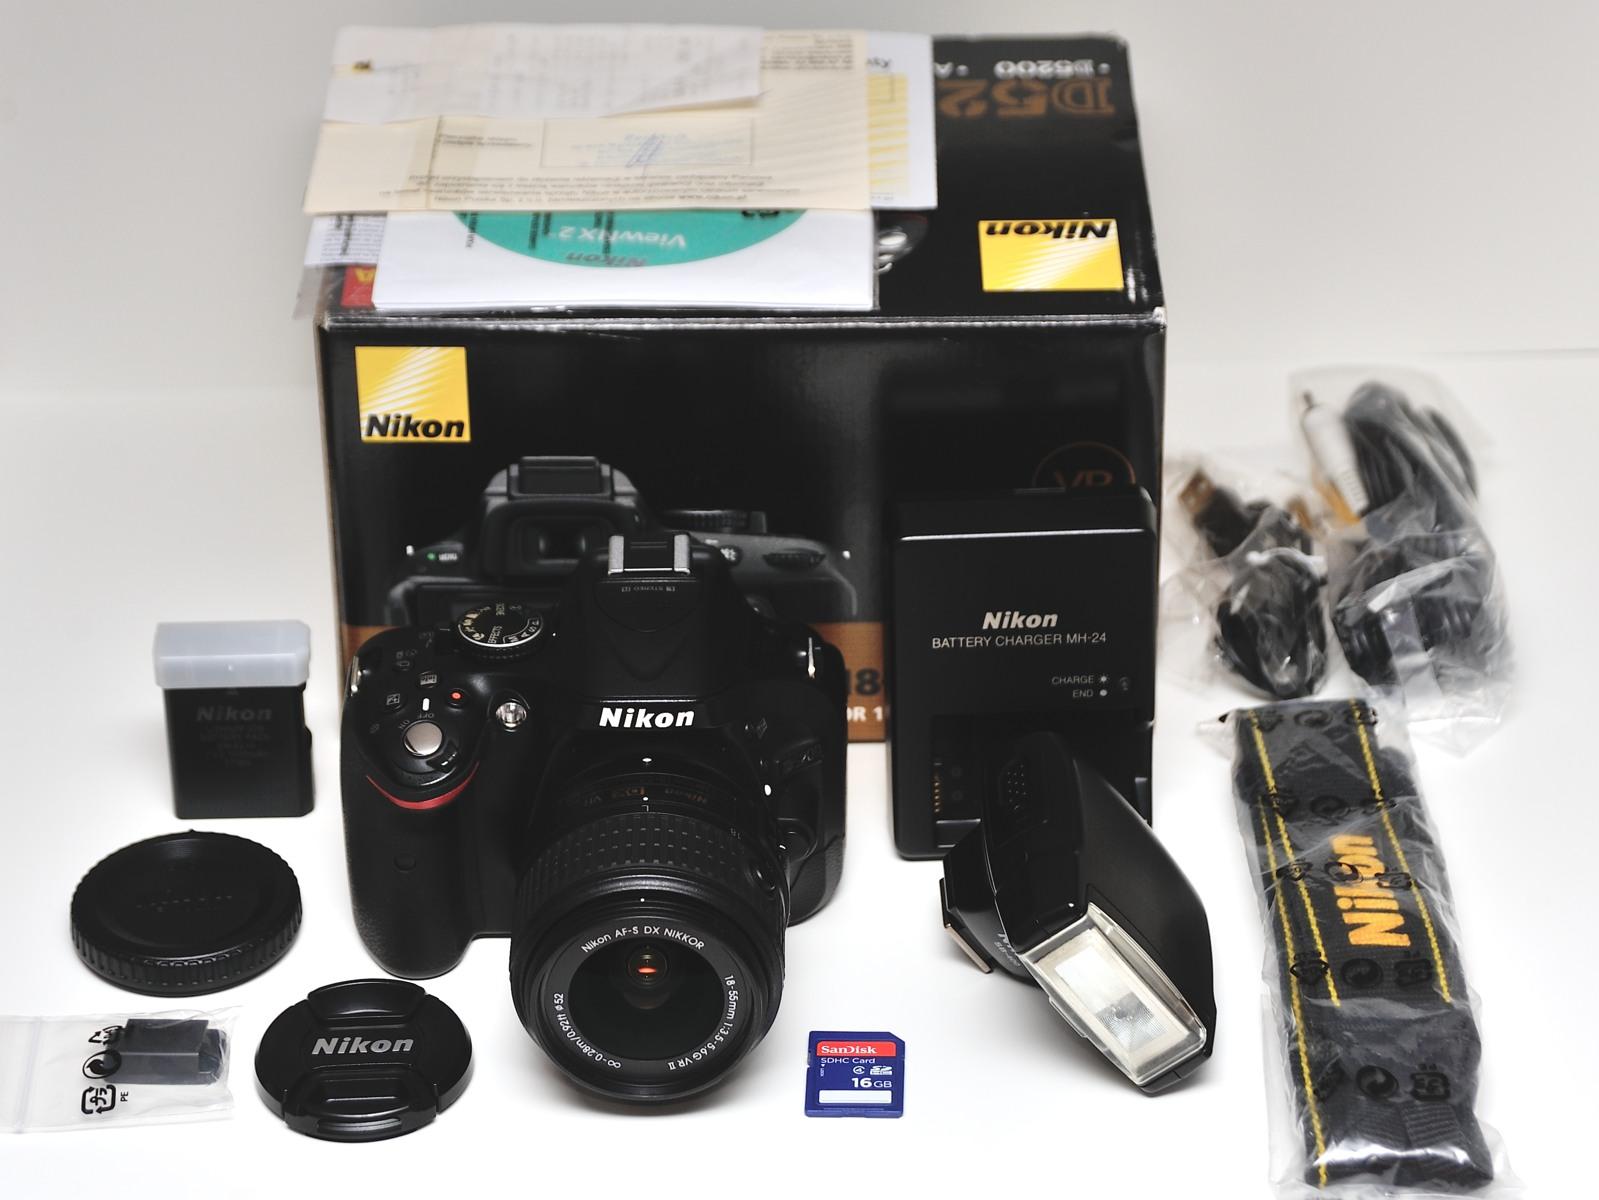 Nikon D5200 + Nikkor VR 18-55 + lampa SB-400 +16GB